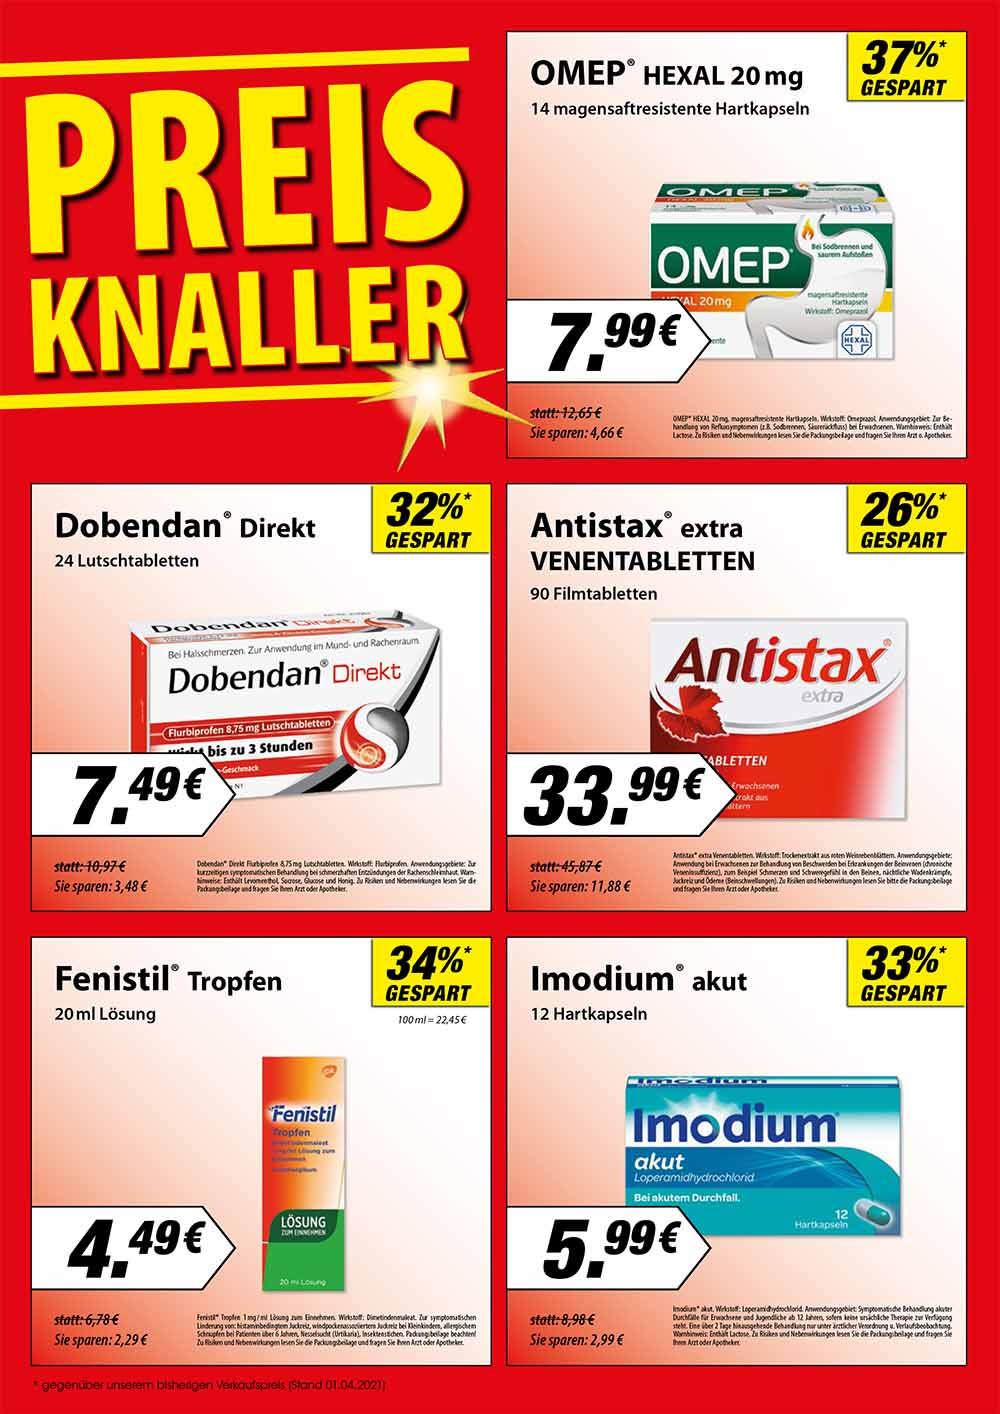 https://www-apotheken-de.apocdn.net/fileadmin/clubarea/00000-Angebote/35232_11932_am_huenstein_angebot_2.jpg